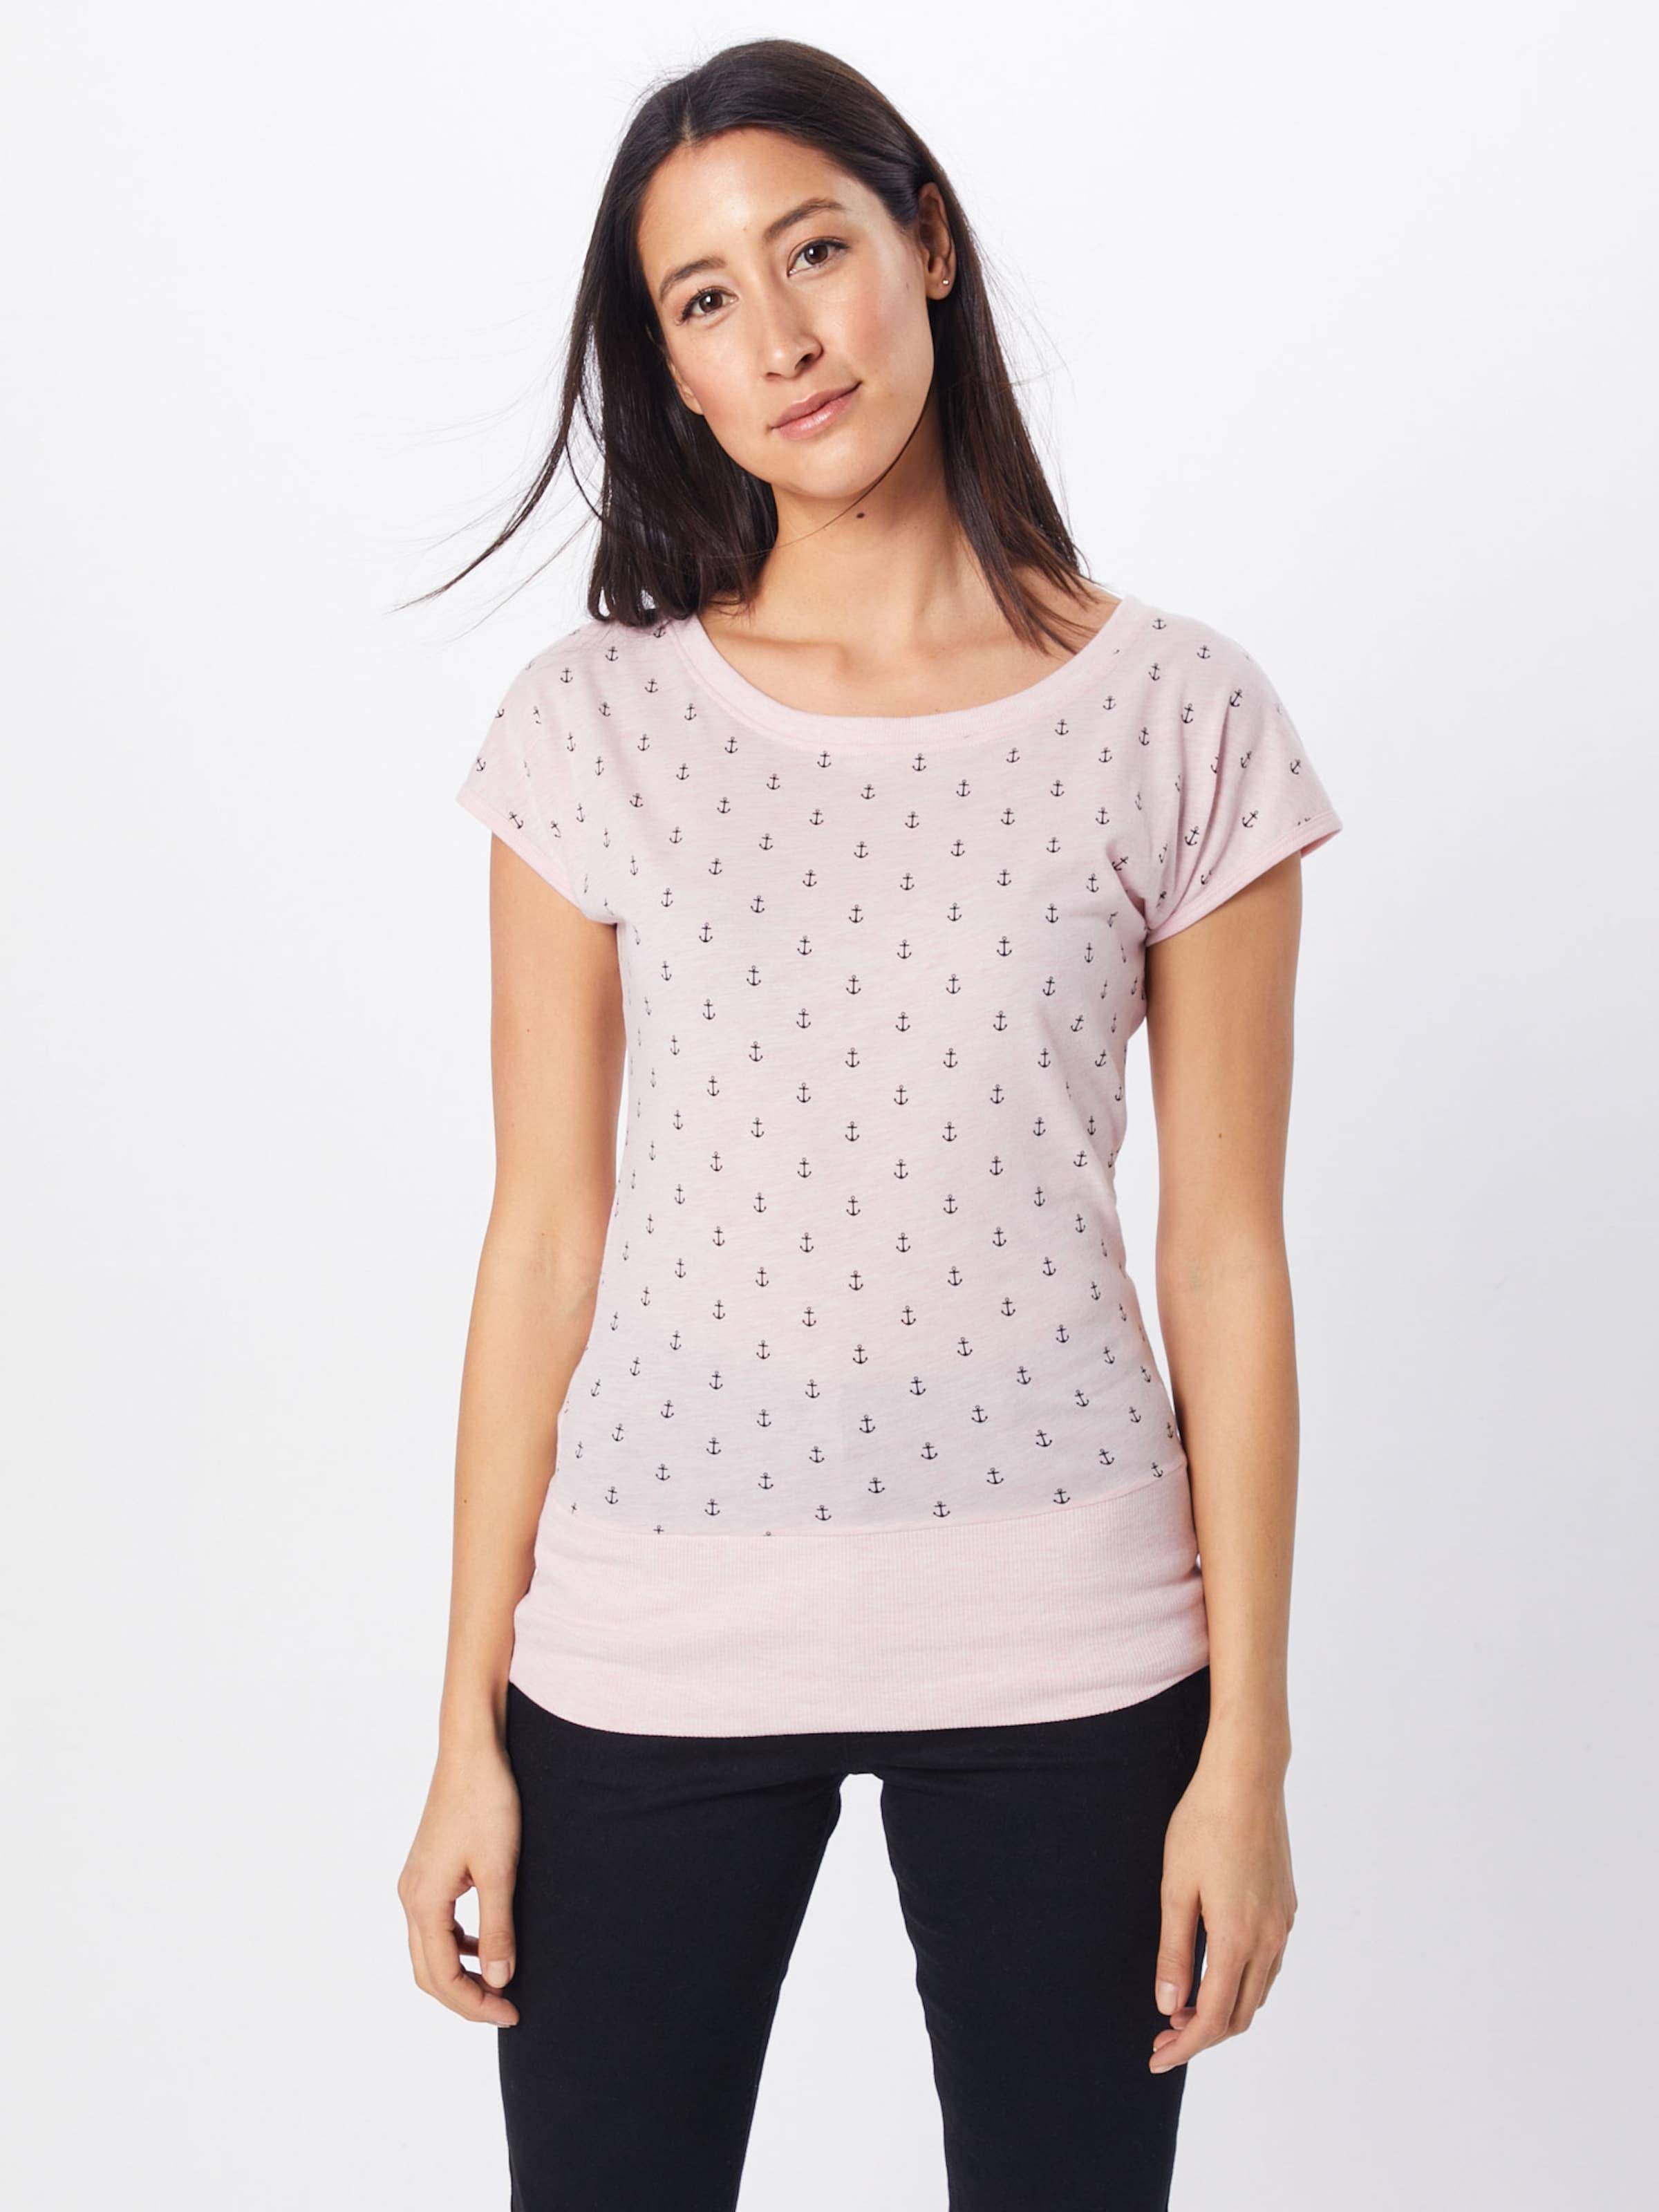 PinkSchwarz Shirt In You 'ronja' About Pn0kwO